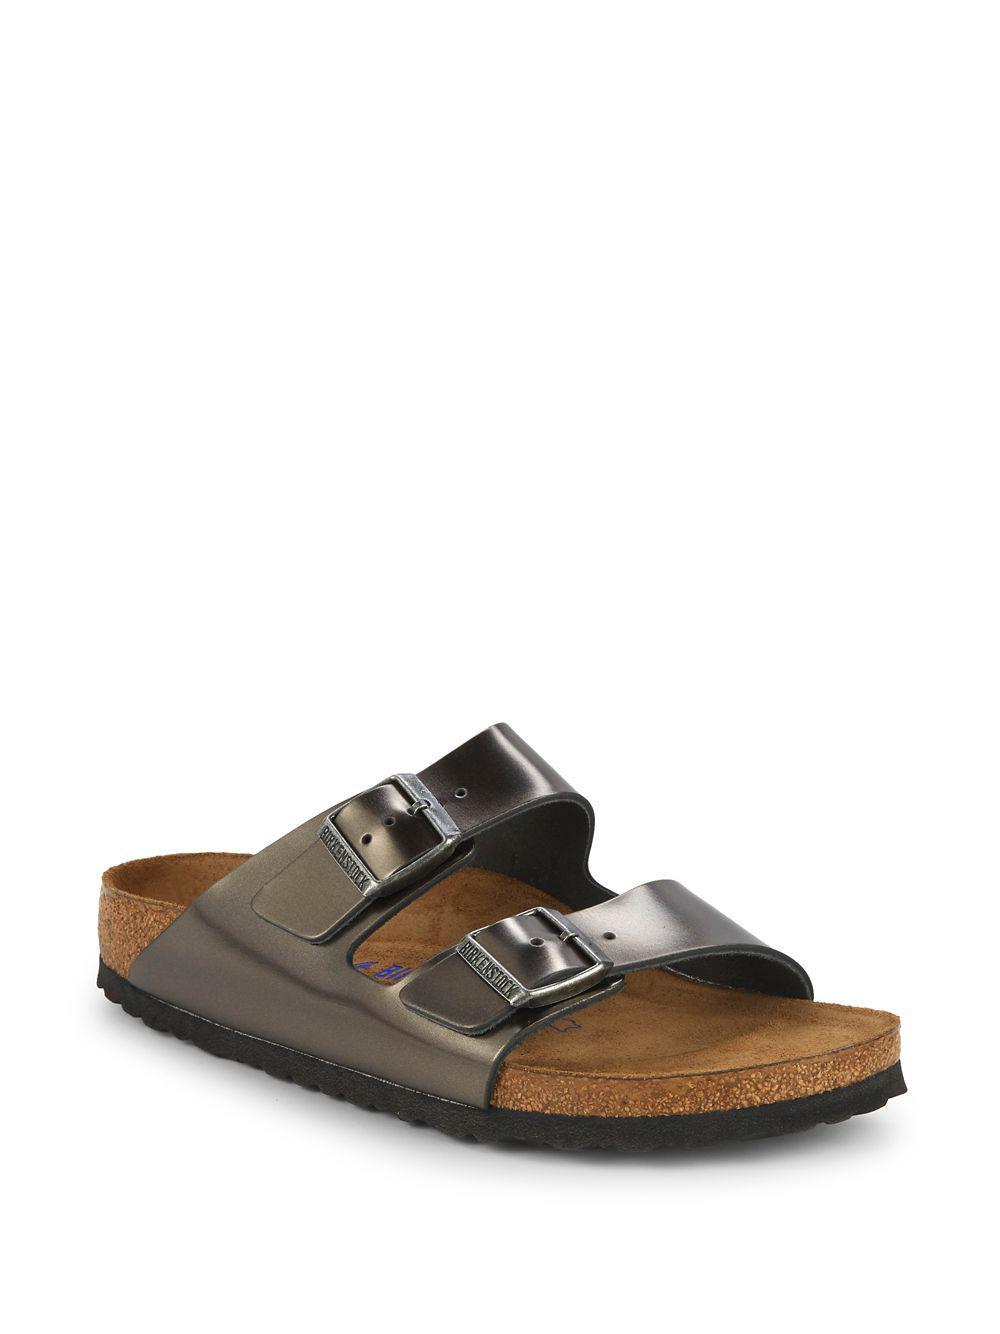 370b4c810a9b Lyst - Birkenstock Arizona Mules   Casual Shoes in Gray